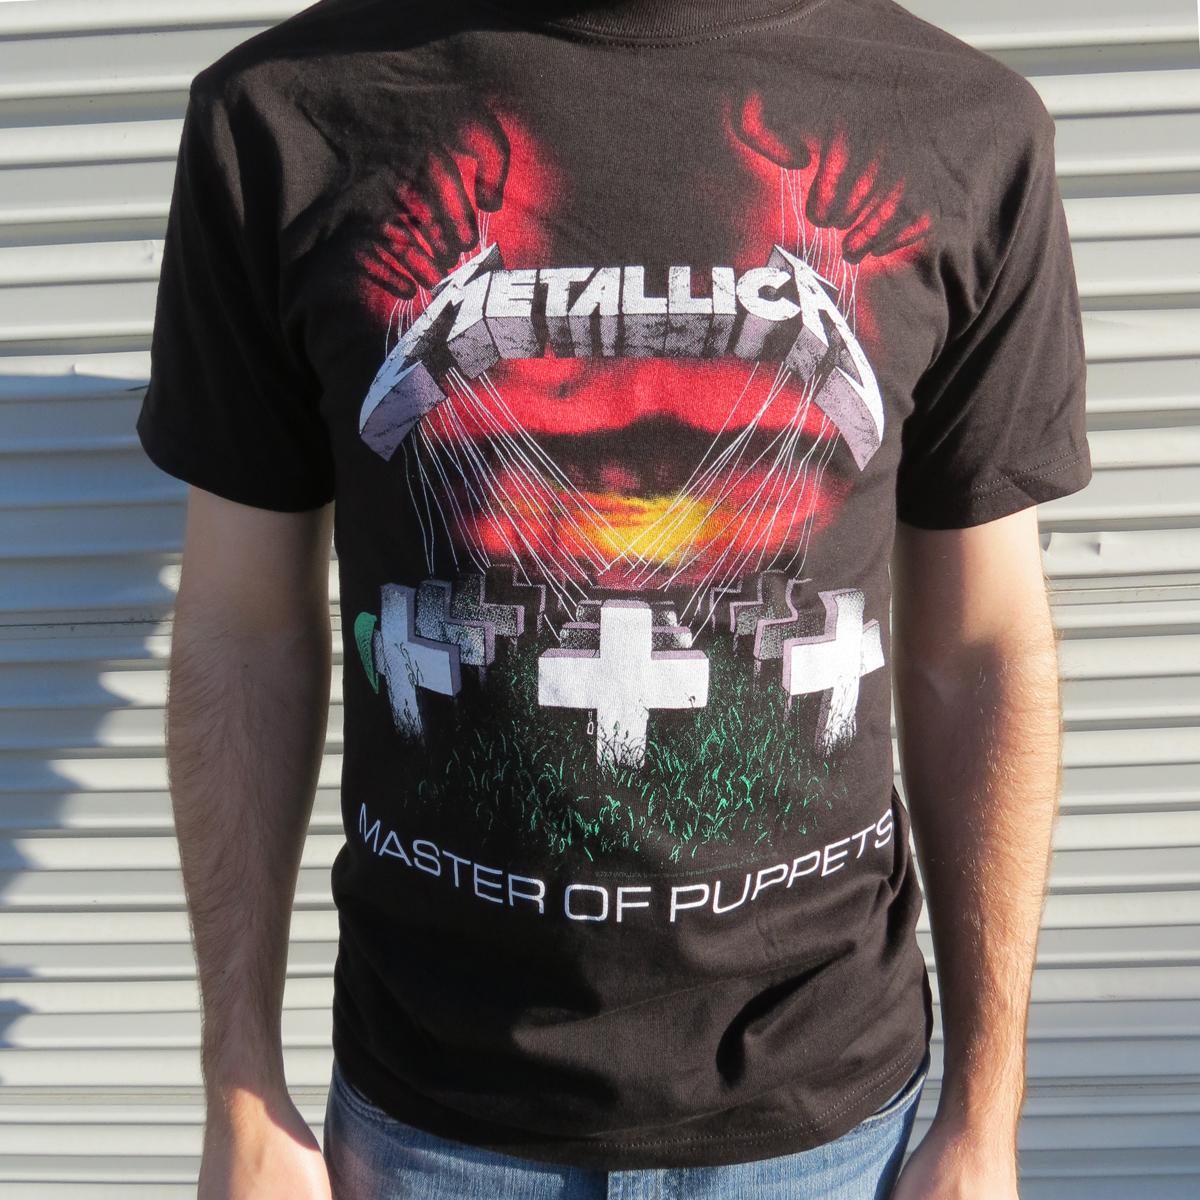 METALLICA.com | Store | Master of Puppets T-shirt